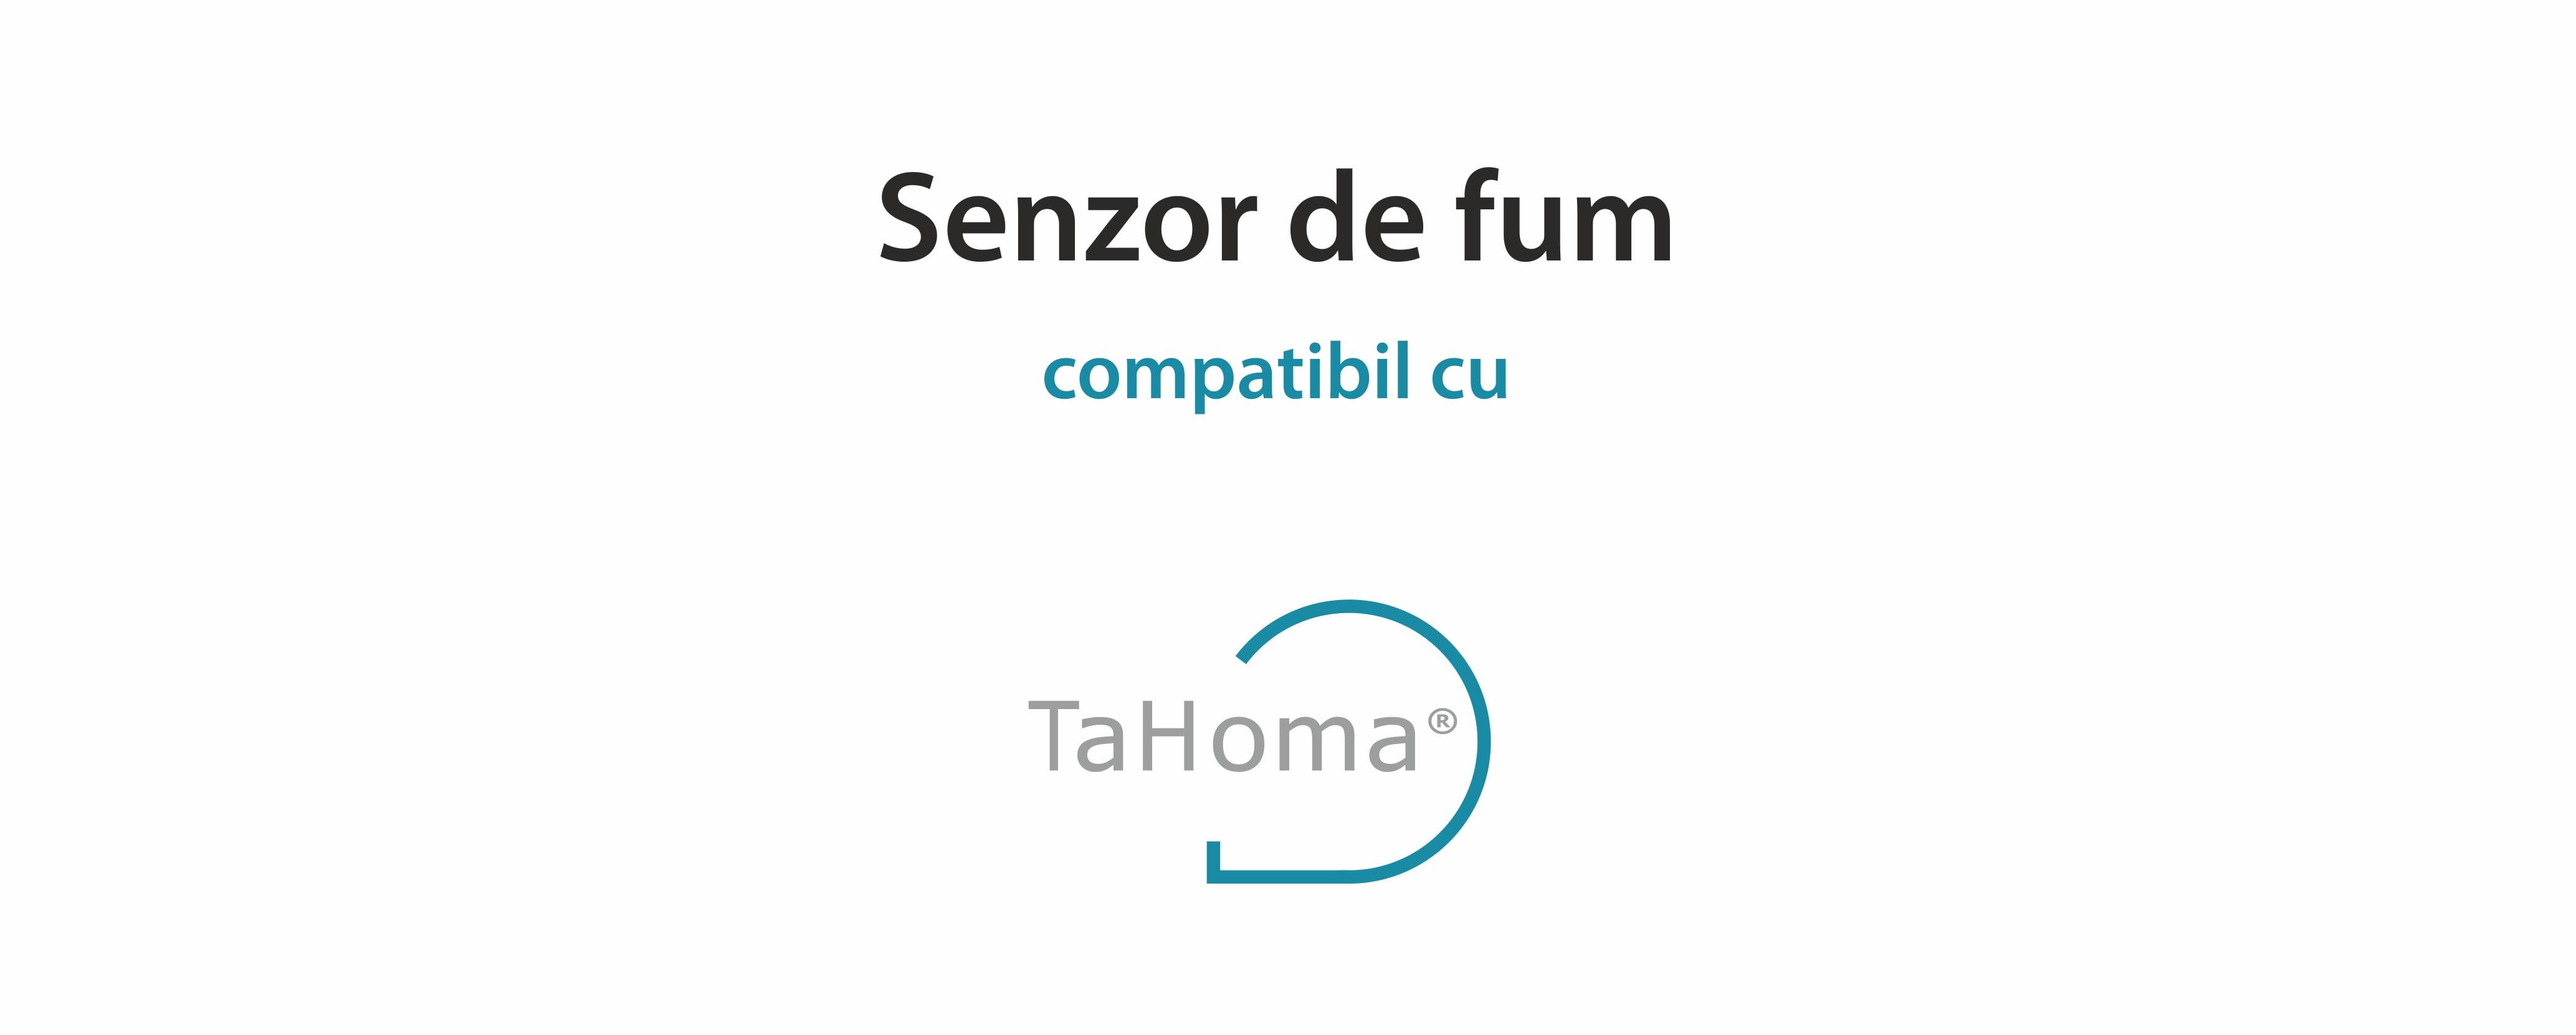 Senzor de fum TaHoma cu Alarma Integrata pentru Detectarea incendiilor, IP20, Frecventa radio 868-870 MHz 14